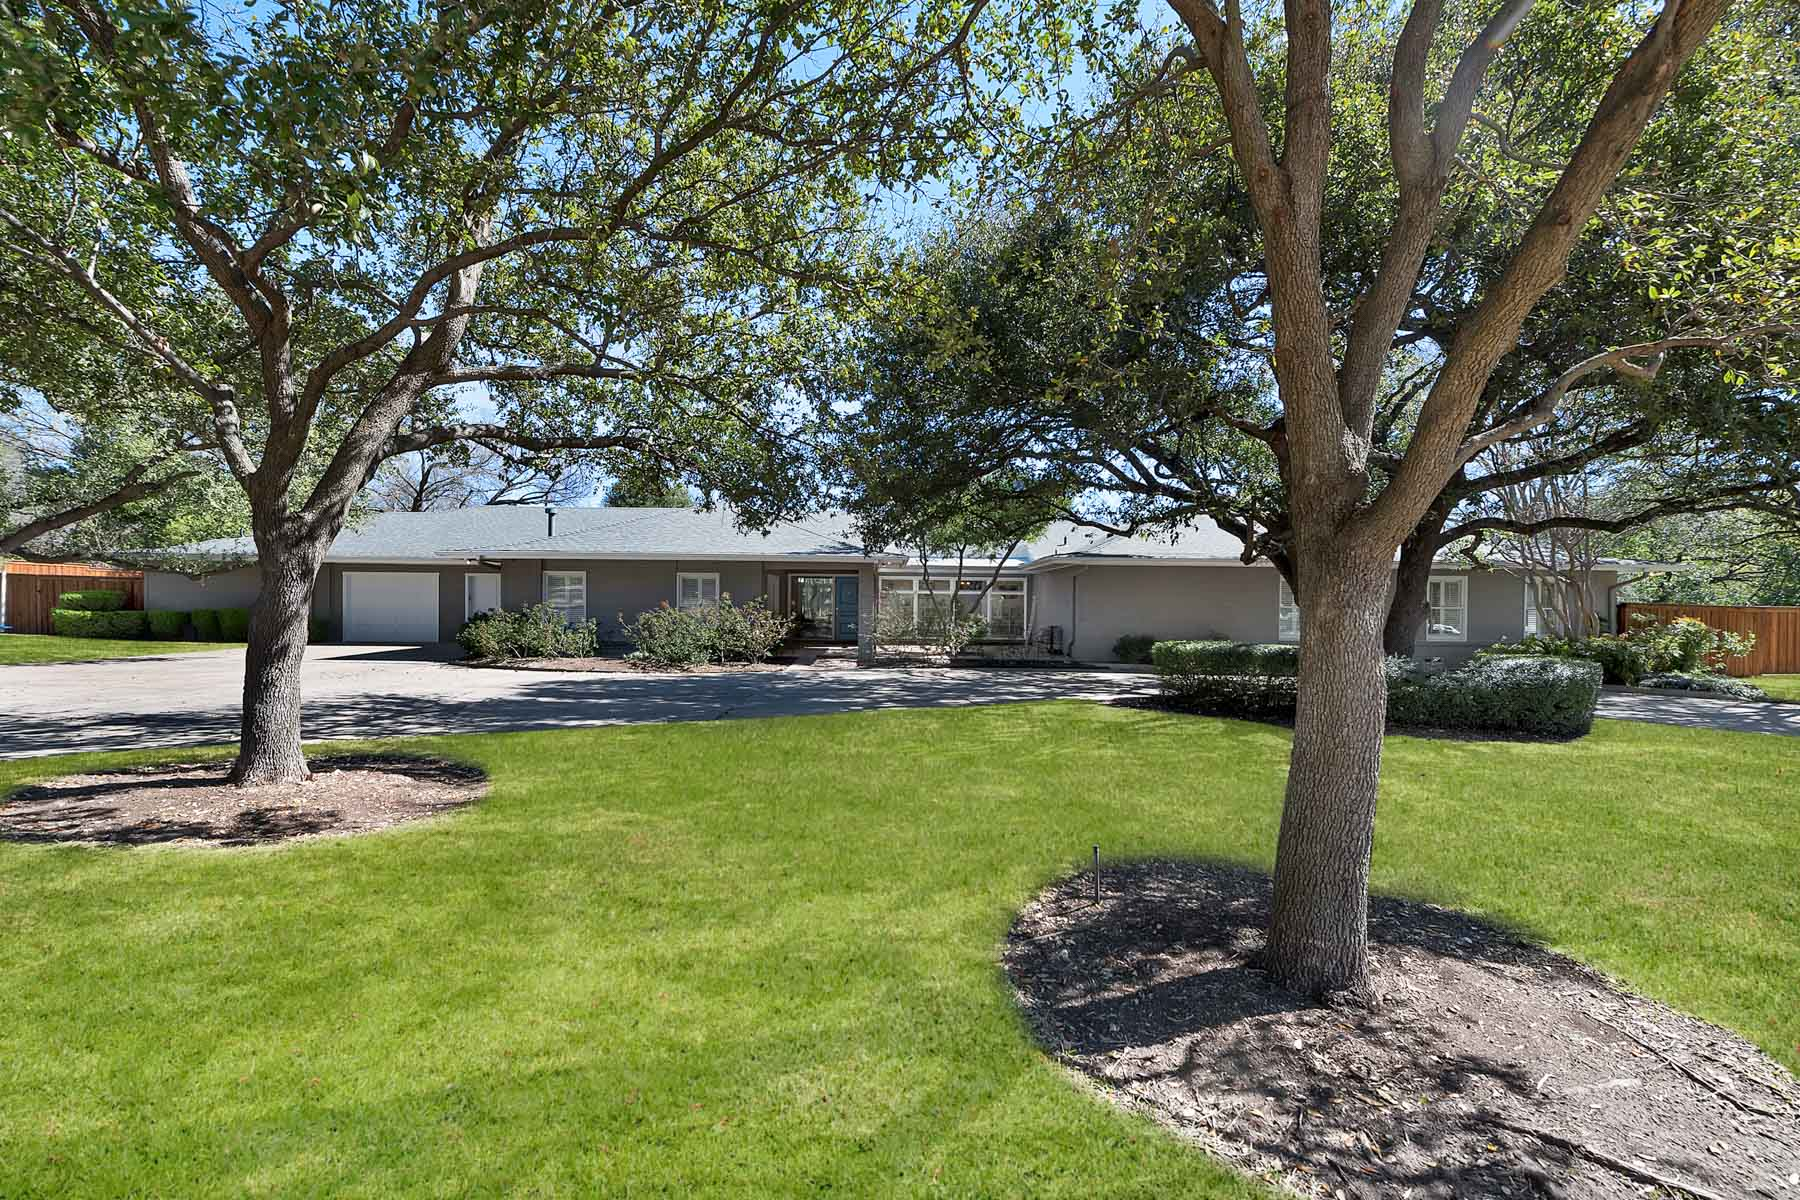 Moradia para Venda às Ridglea, Mid-Century Modern Ranch 4225 Ridgehaven Rd Fort Worth, Texas, 76116 Estados Unidos